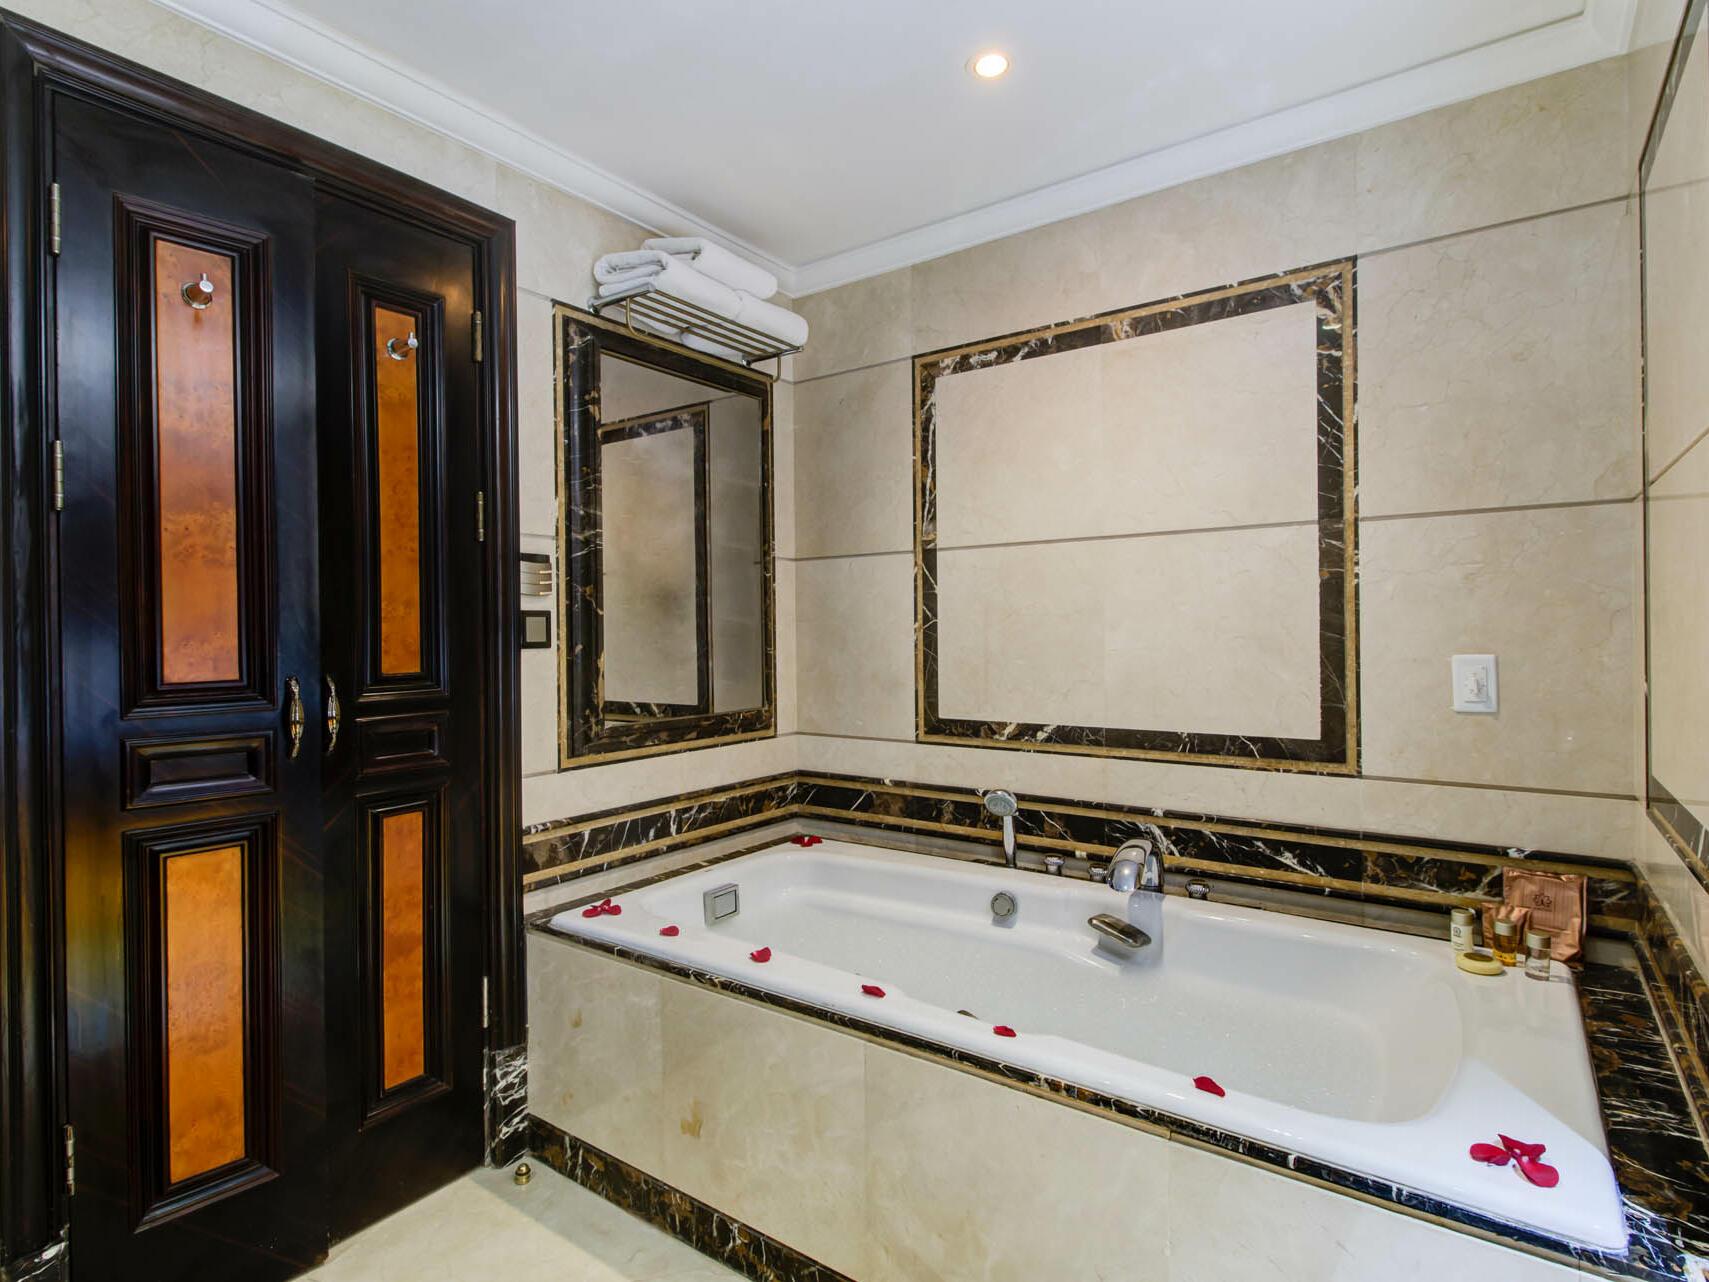 Premium Suite at Narcissus Hotel & Spa Riyadh